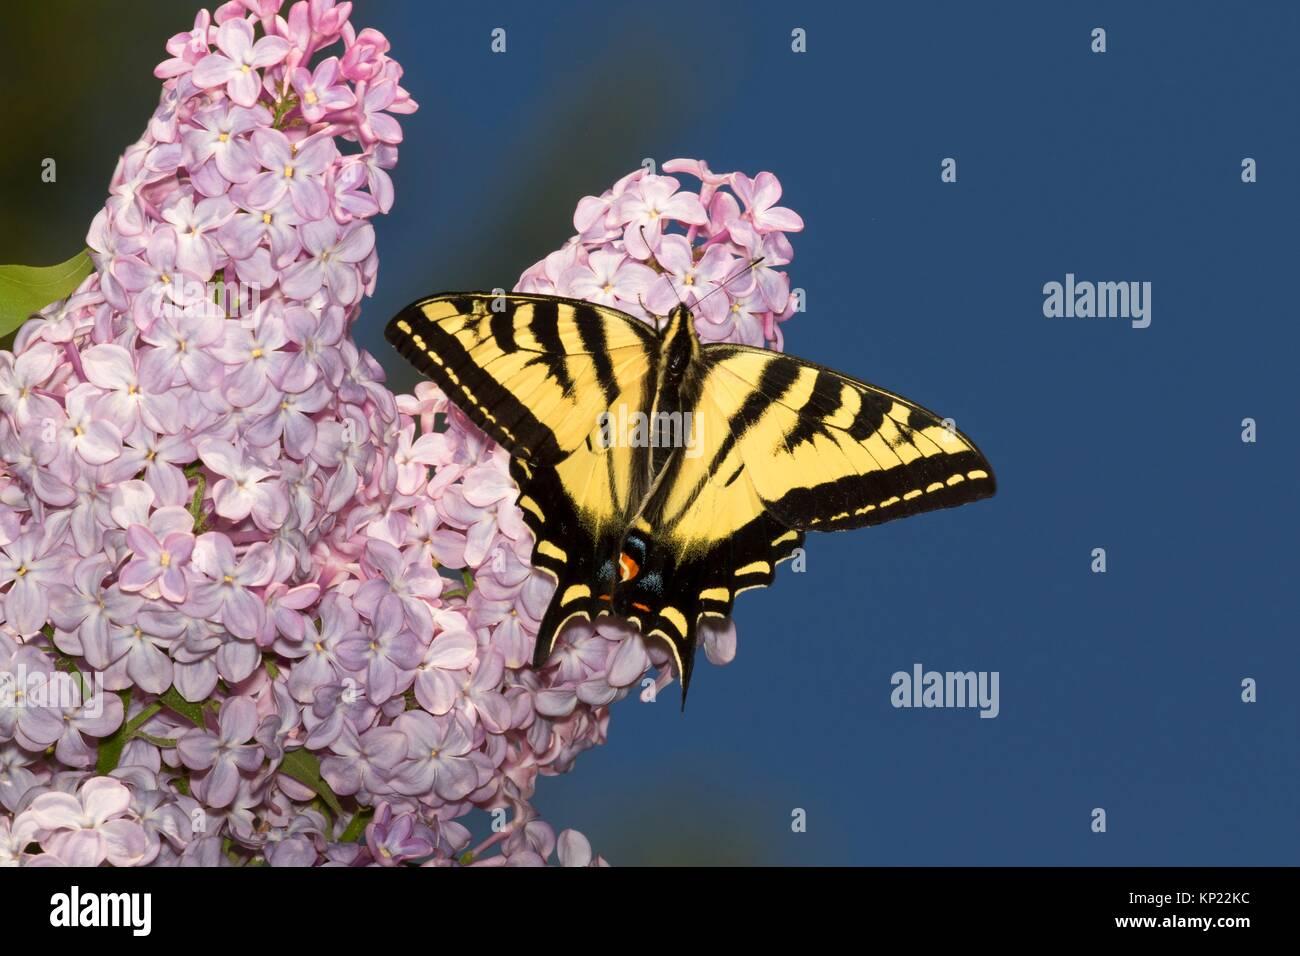 Swallowtail butterfly on lilac, Kootenai National Wildlife Refuge, Idaho. - Stock Image